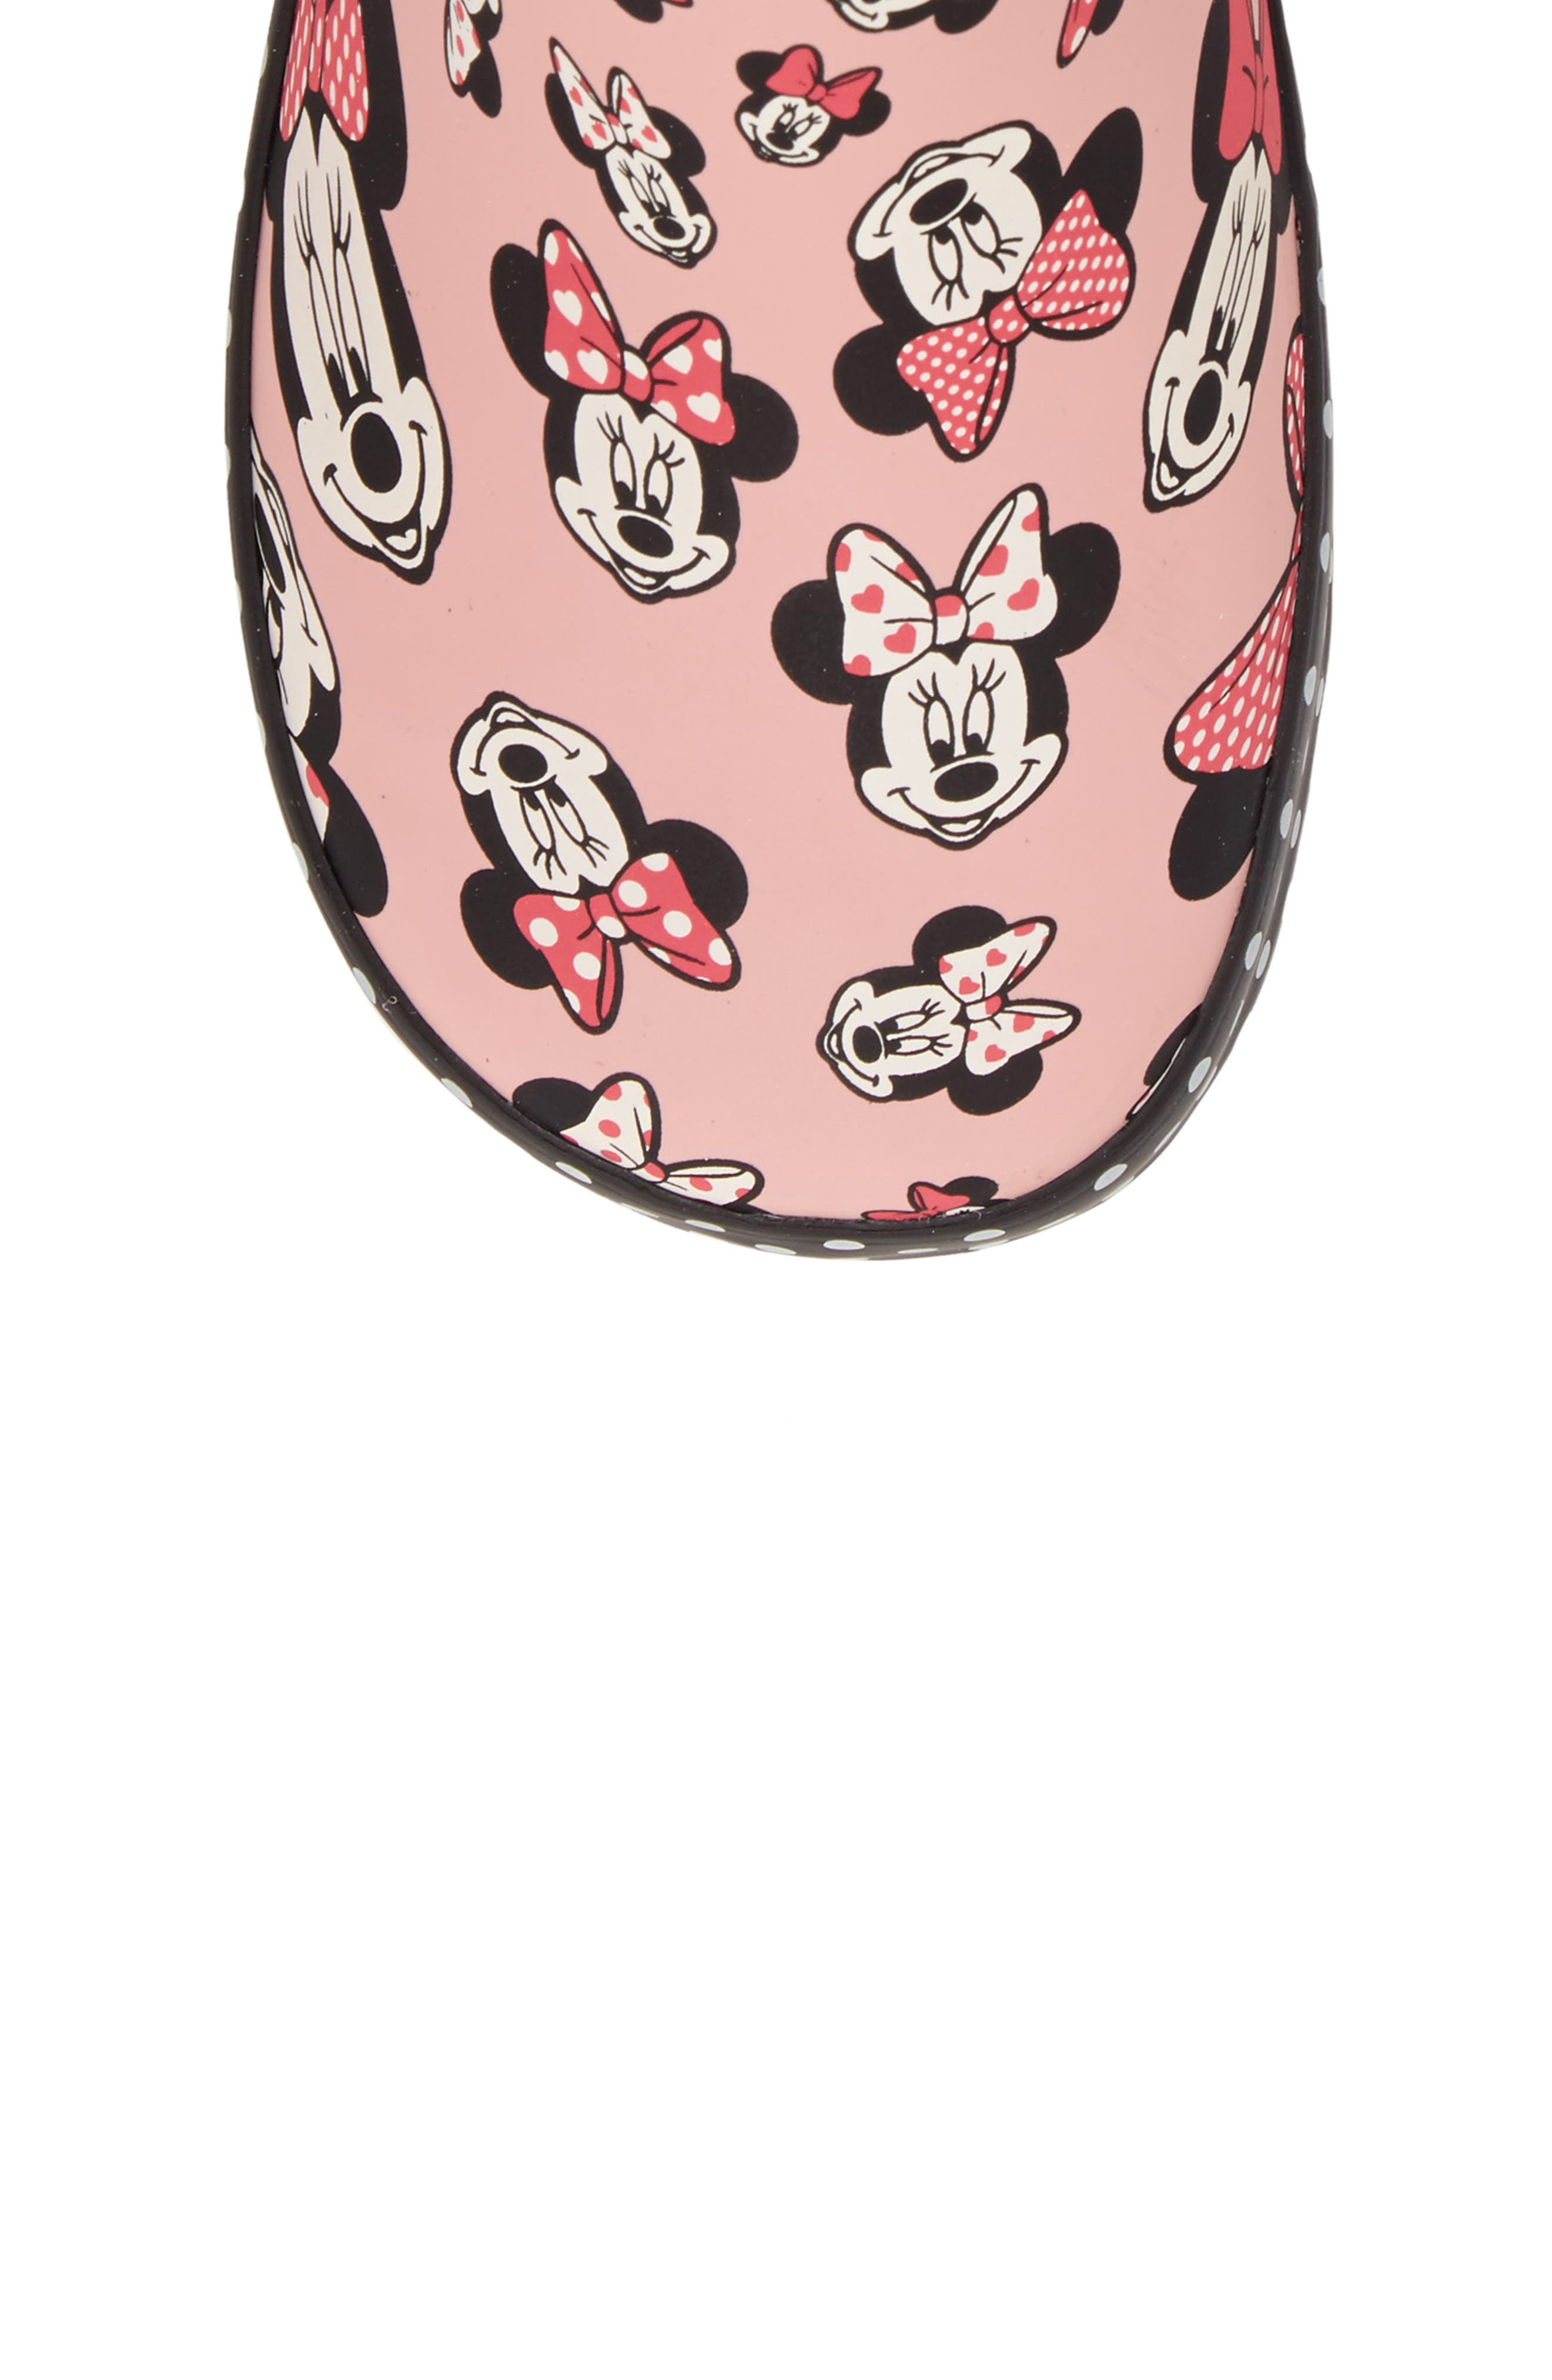 Disney<sup>®</sup> Minnie Mouse Waterproof Rain Boot,                             Alternate thumbnail 5, color,                             680